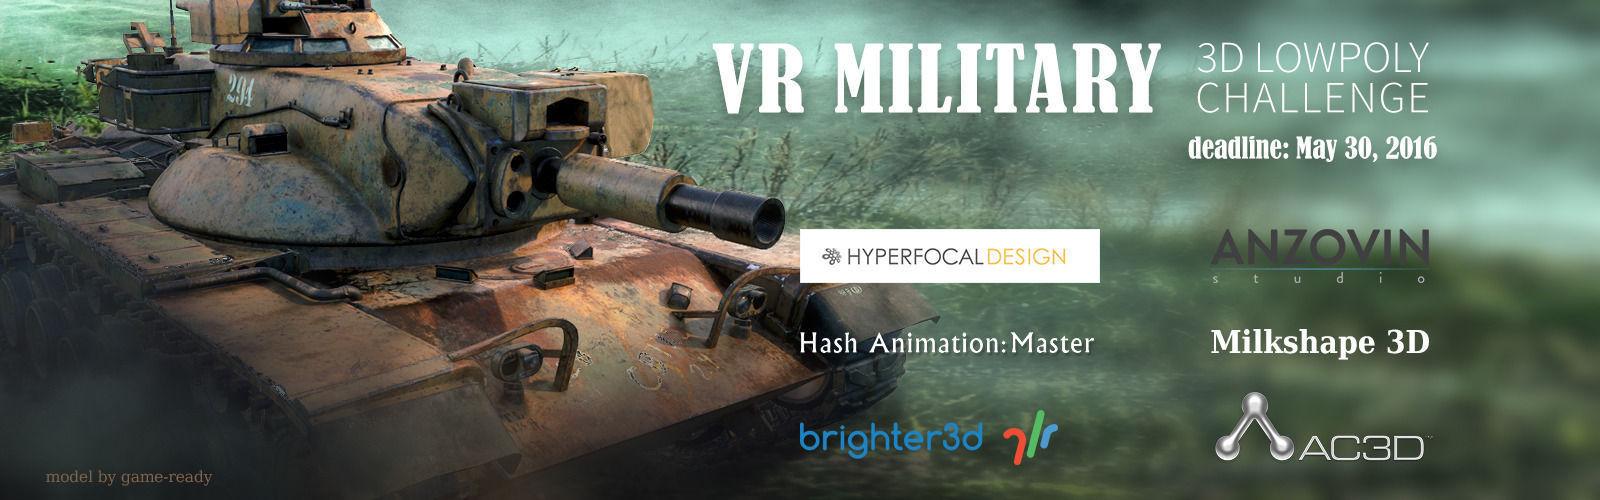 VR Military Challenge